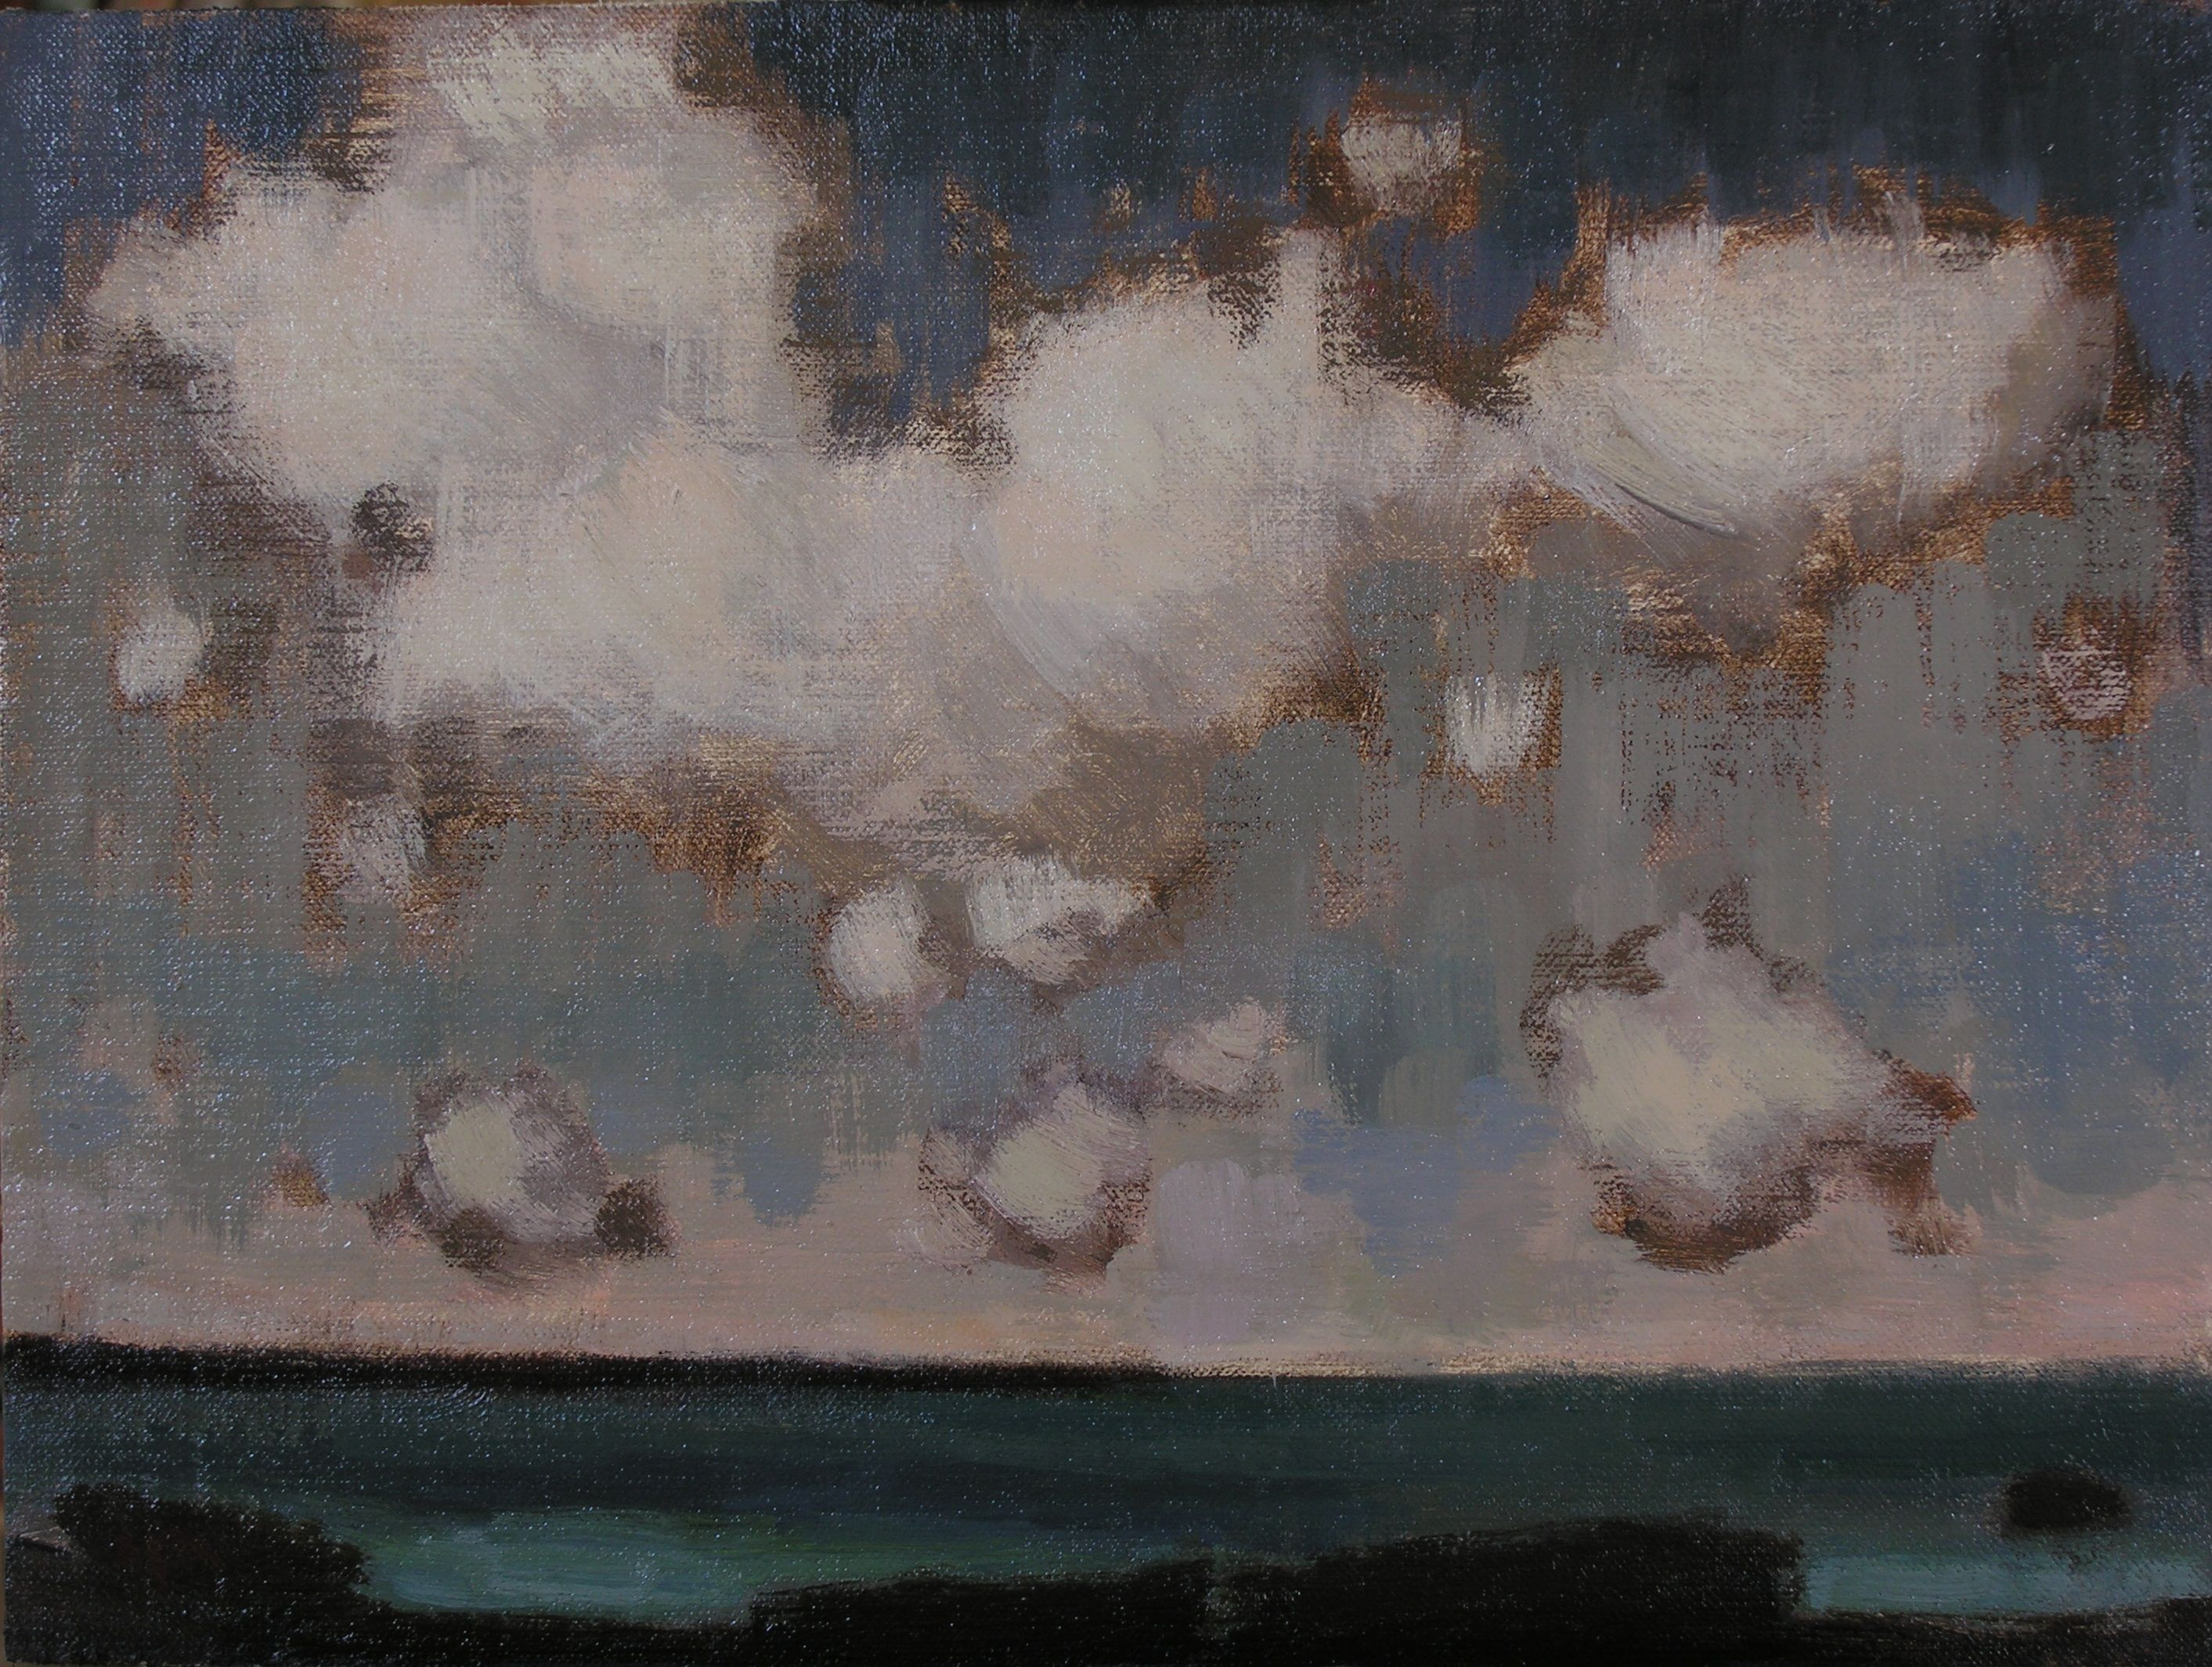 Paula Rubino, Suspended Cumulus, 9 x 12 in, oil on linen panel